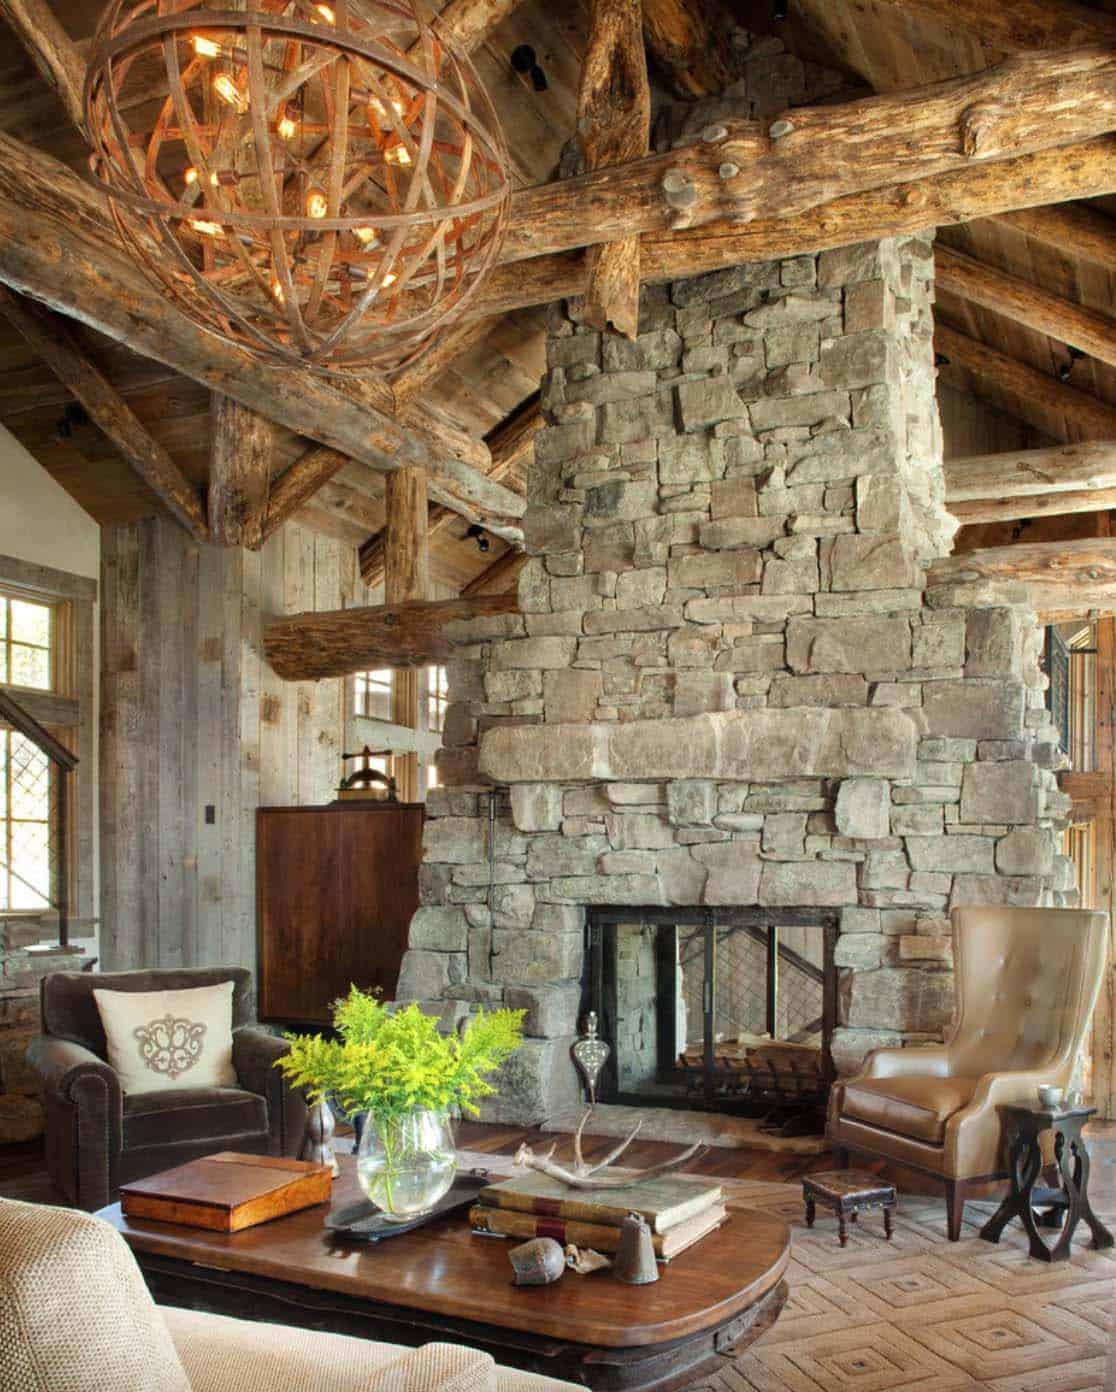 Ski Lodge Hideaway In Montana Boasts Gorgeous Mix Of Rustic